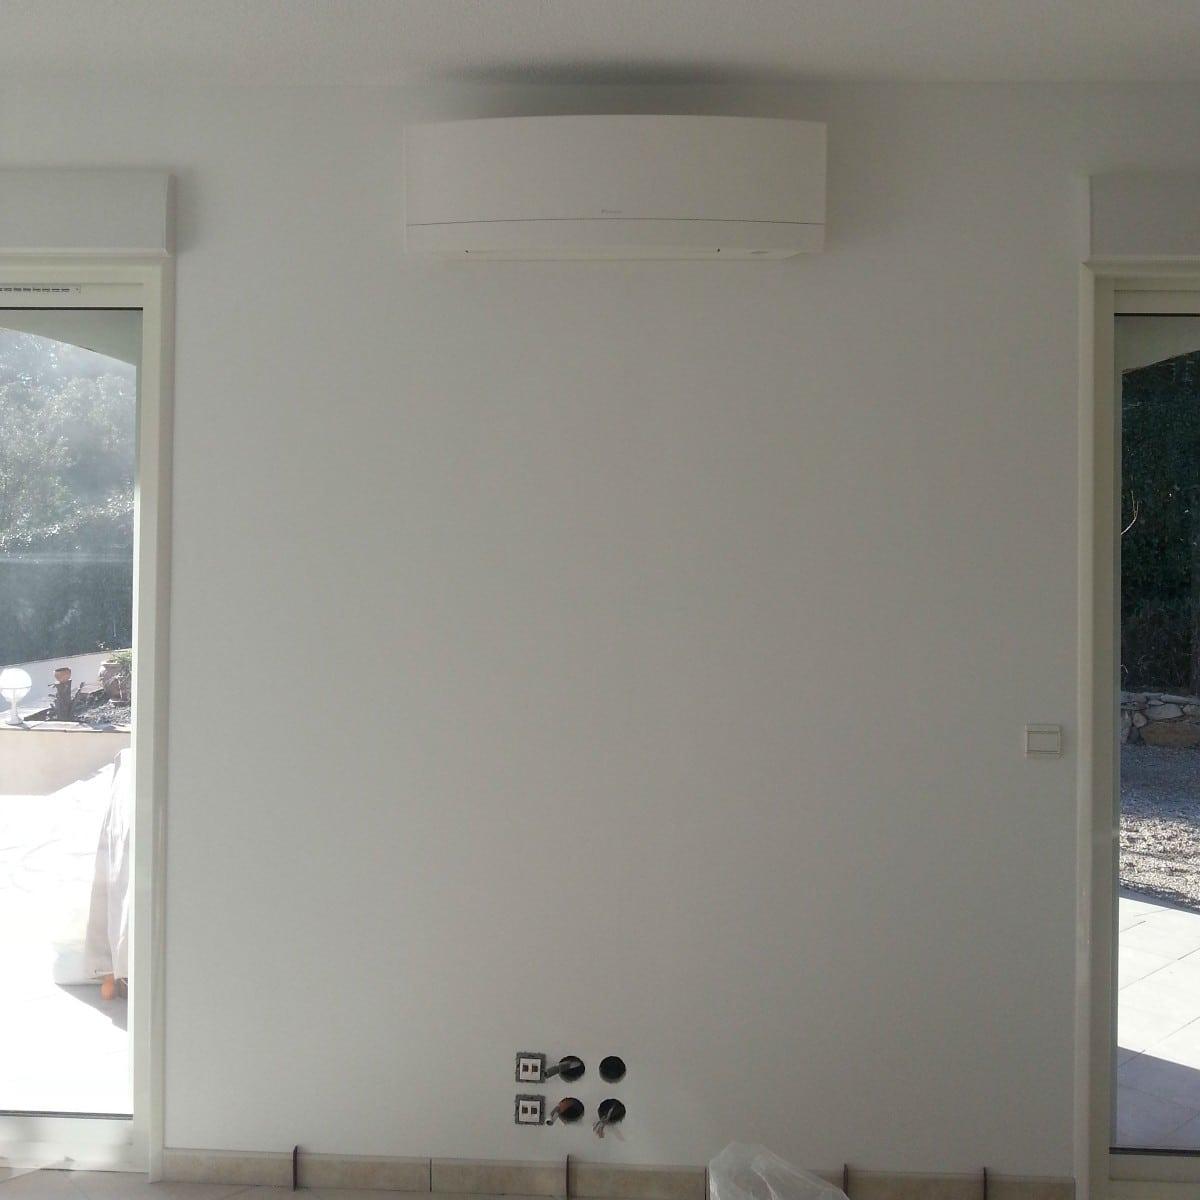 installation d 39 une climatisation r versible dans une villa varoise climatisation dans le var. Black Bedroom Furniture Sets. Home Design Ideas